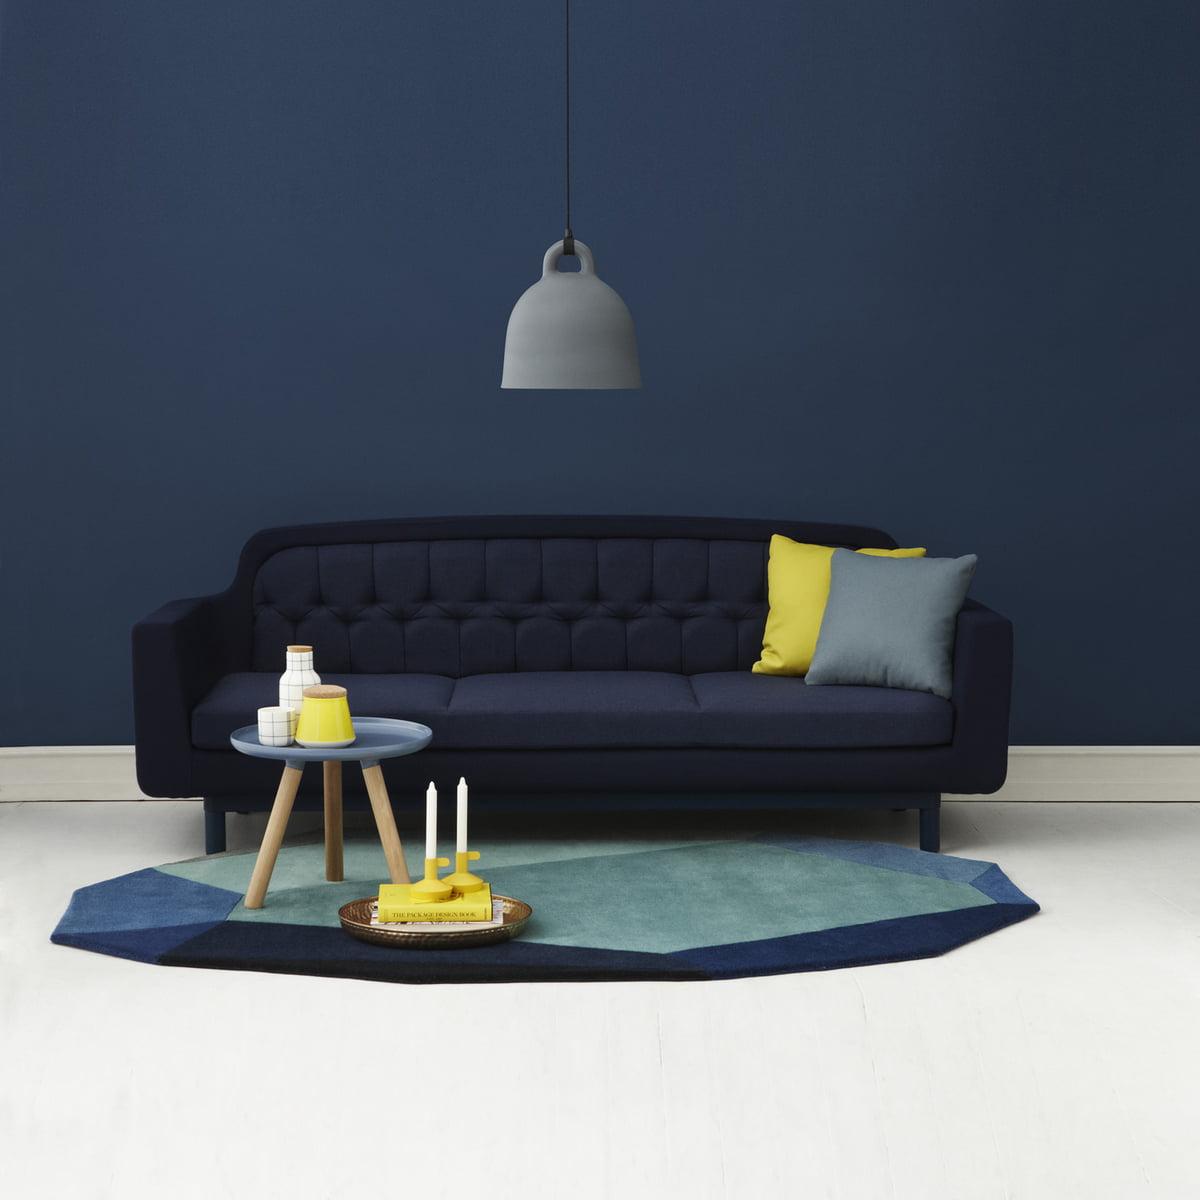 uncle sofa by normann copenhagen. Black Bedroom Furniture Sets. Home Design Ideas